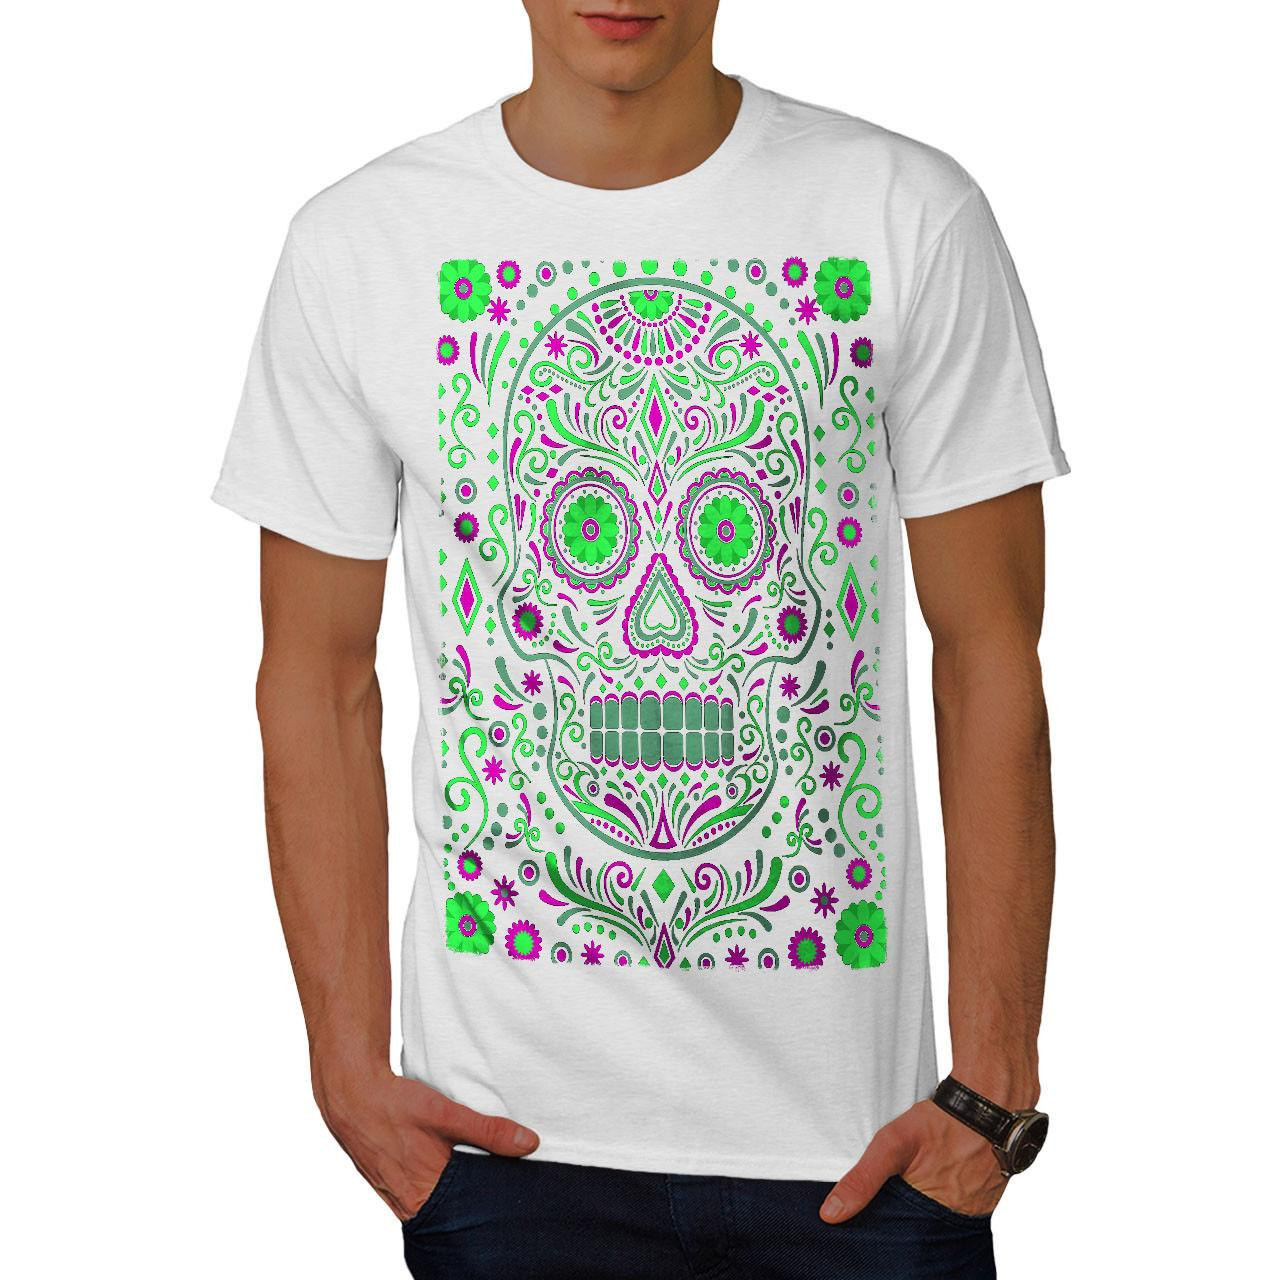 792c6b2b Wellcoda Skull Sugar Acid Art Mens T Shirt, Zombie Graphic Design Printed  Tee Casual Funny Unisex Tee Gift Dirty T Shirts Graphic Tee Shirts From ...